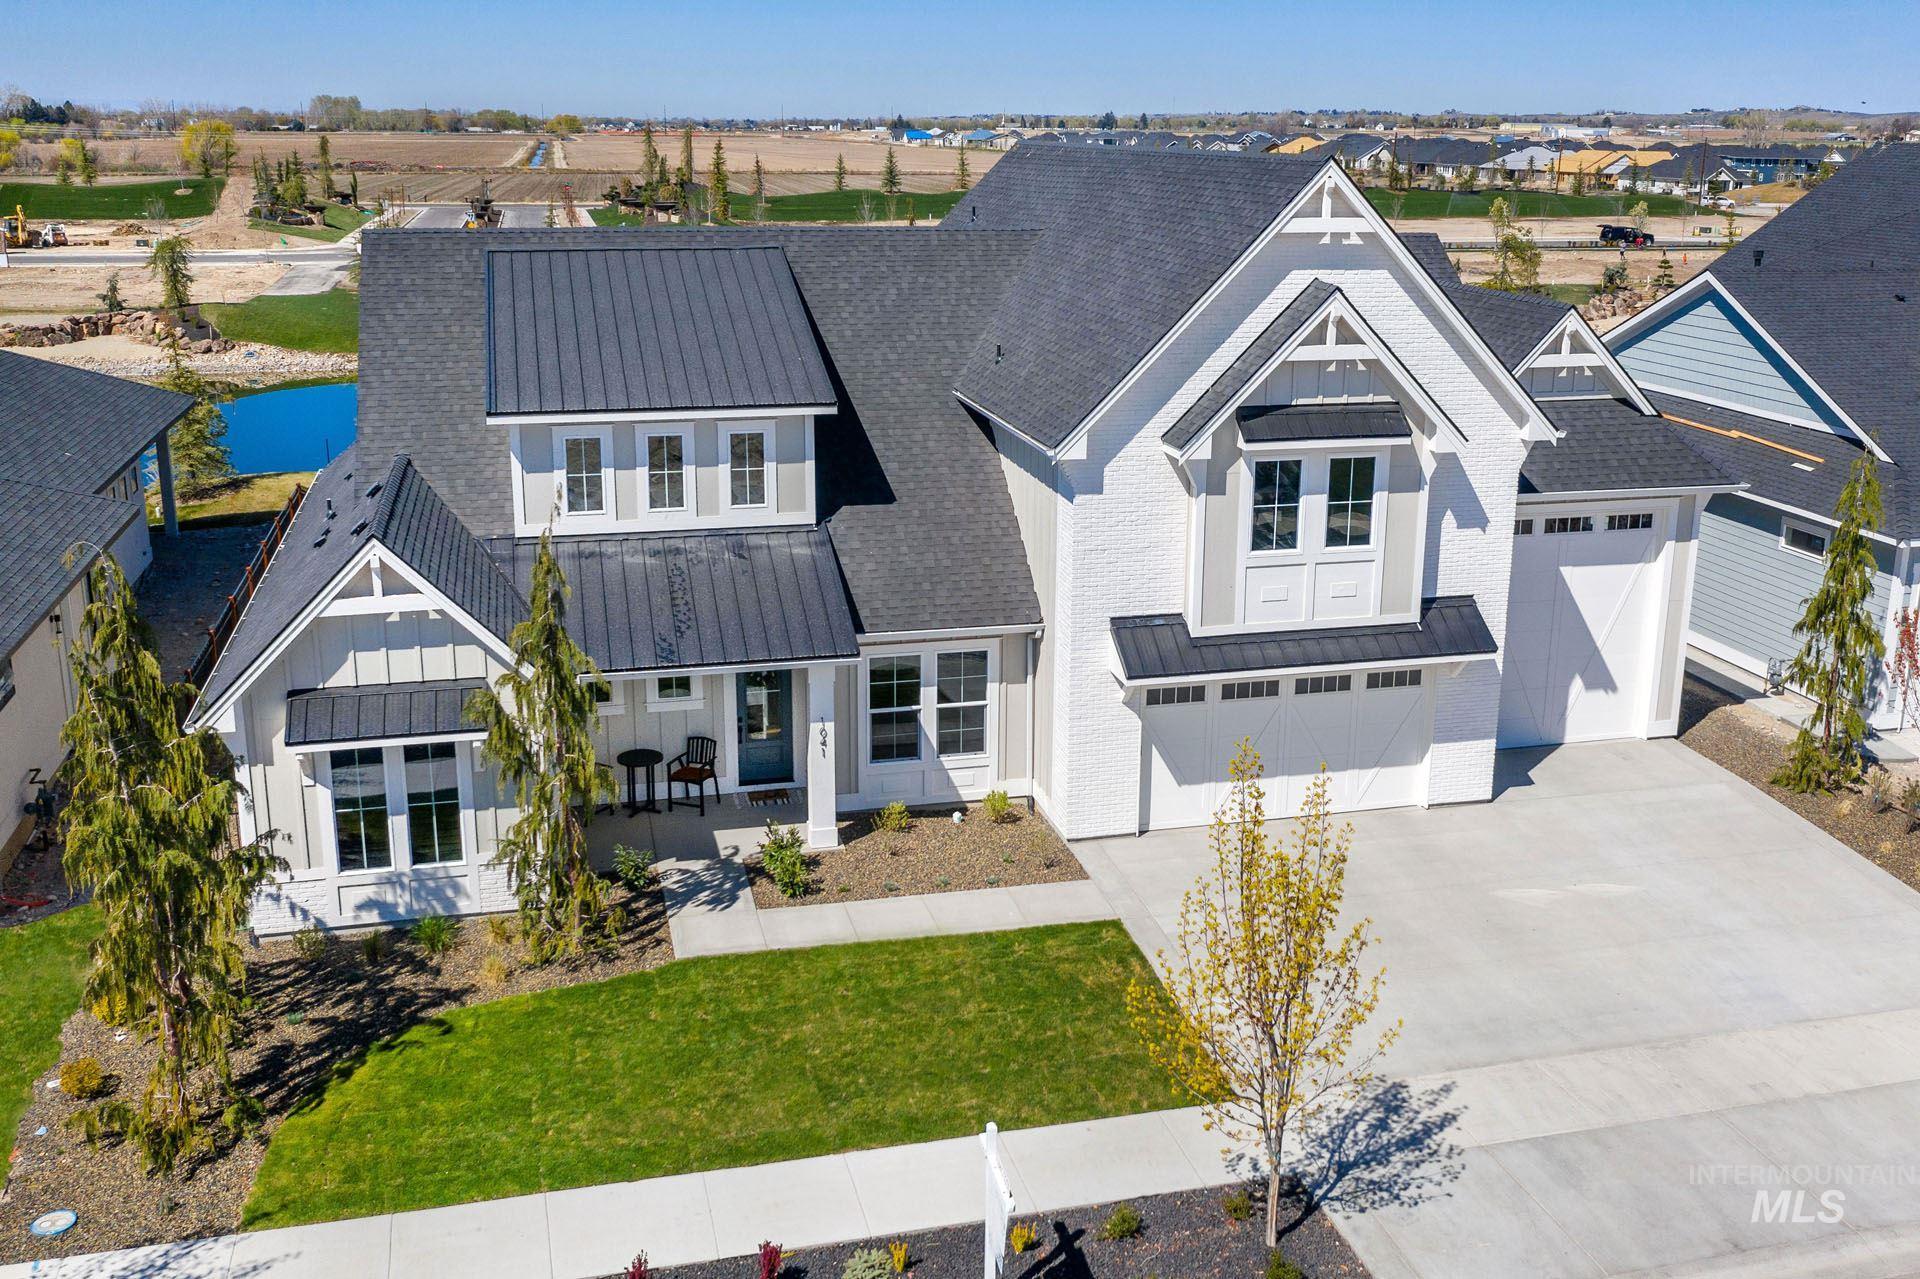 1041 N Honalee Property Photo - Eagle, ID real estate listing